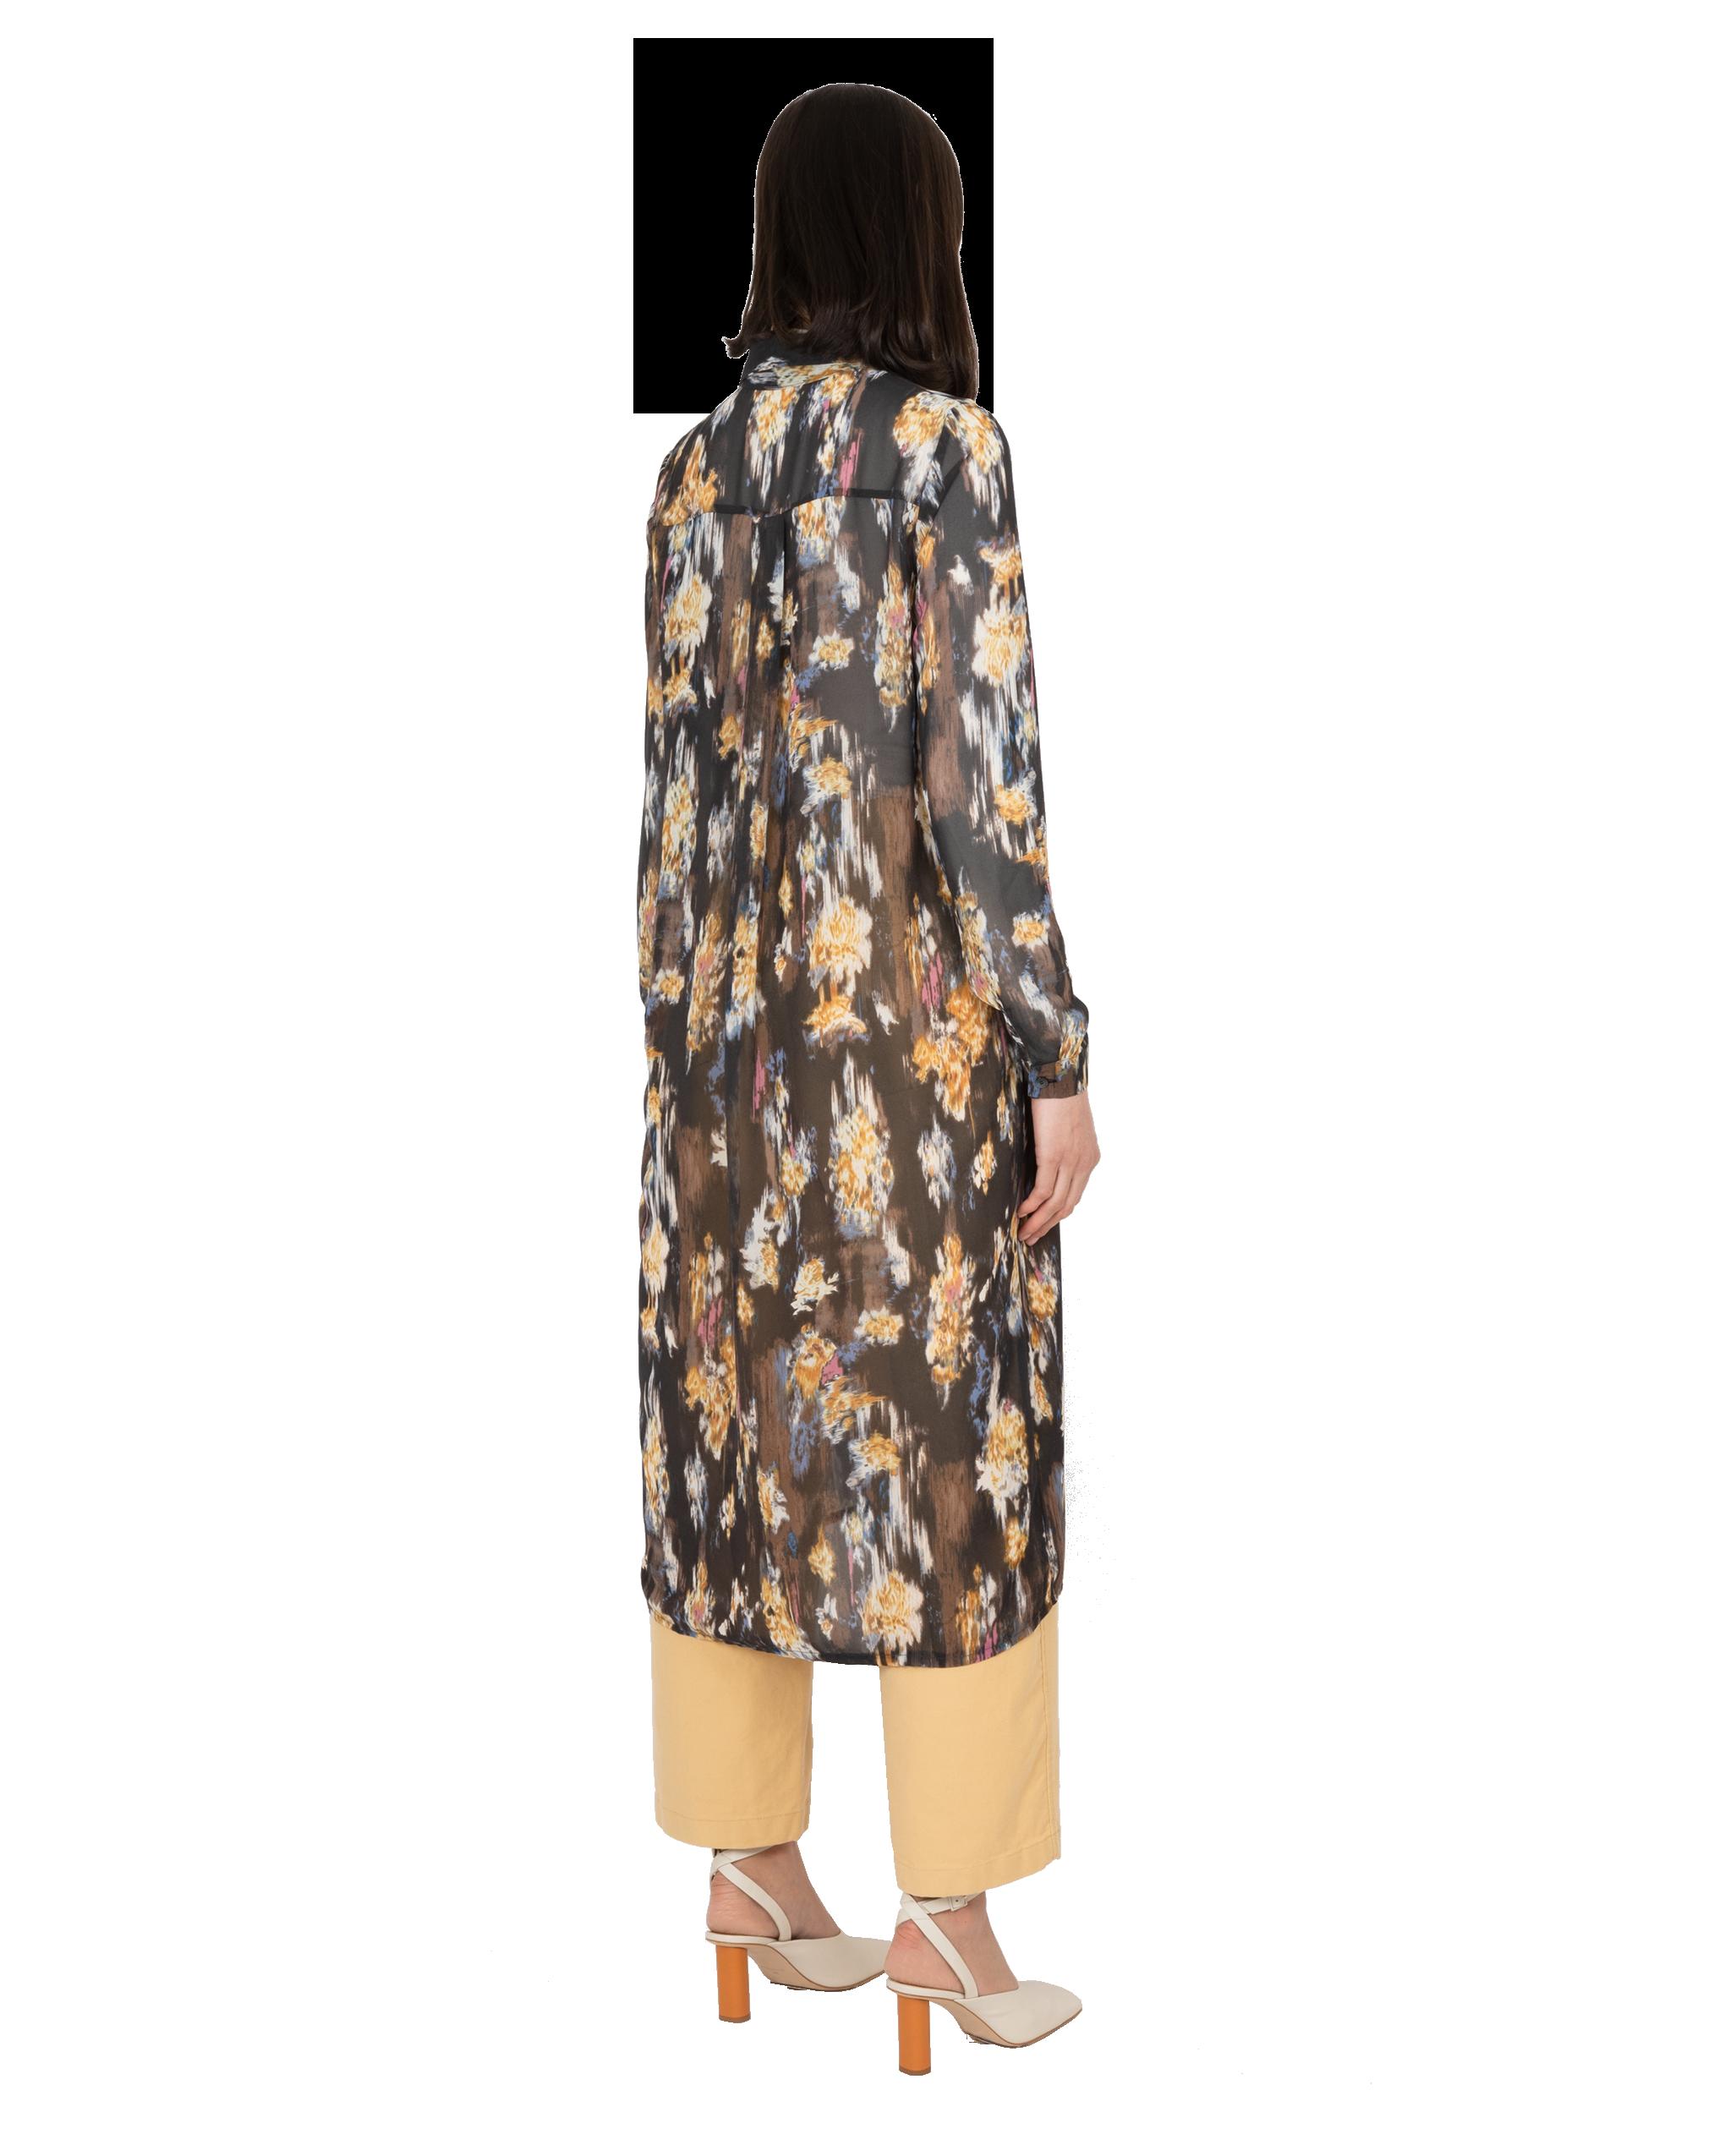 Model wearing EMIN + PAUL multi printed shirt dress.